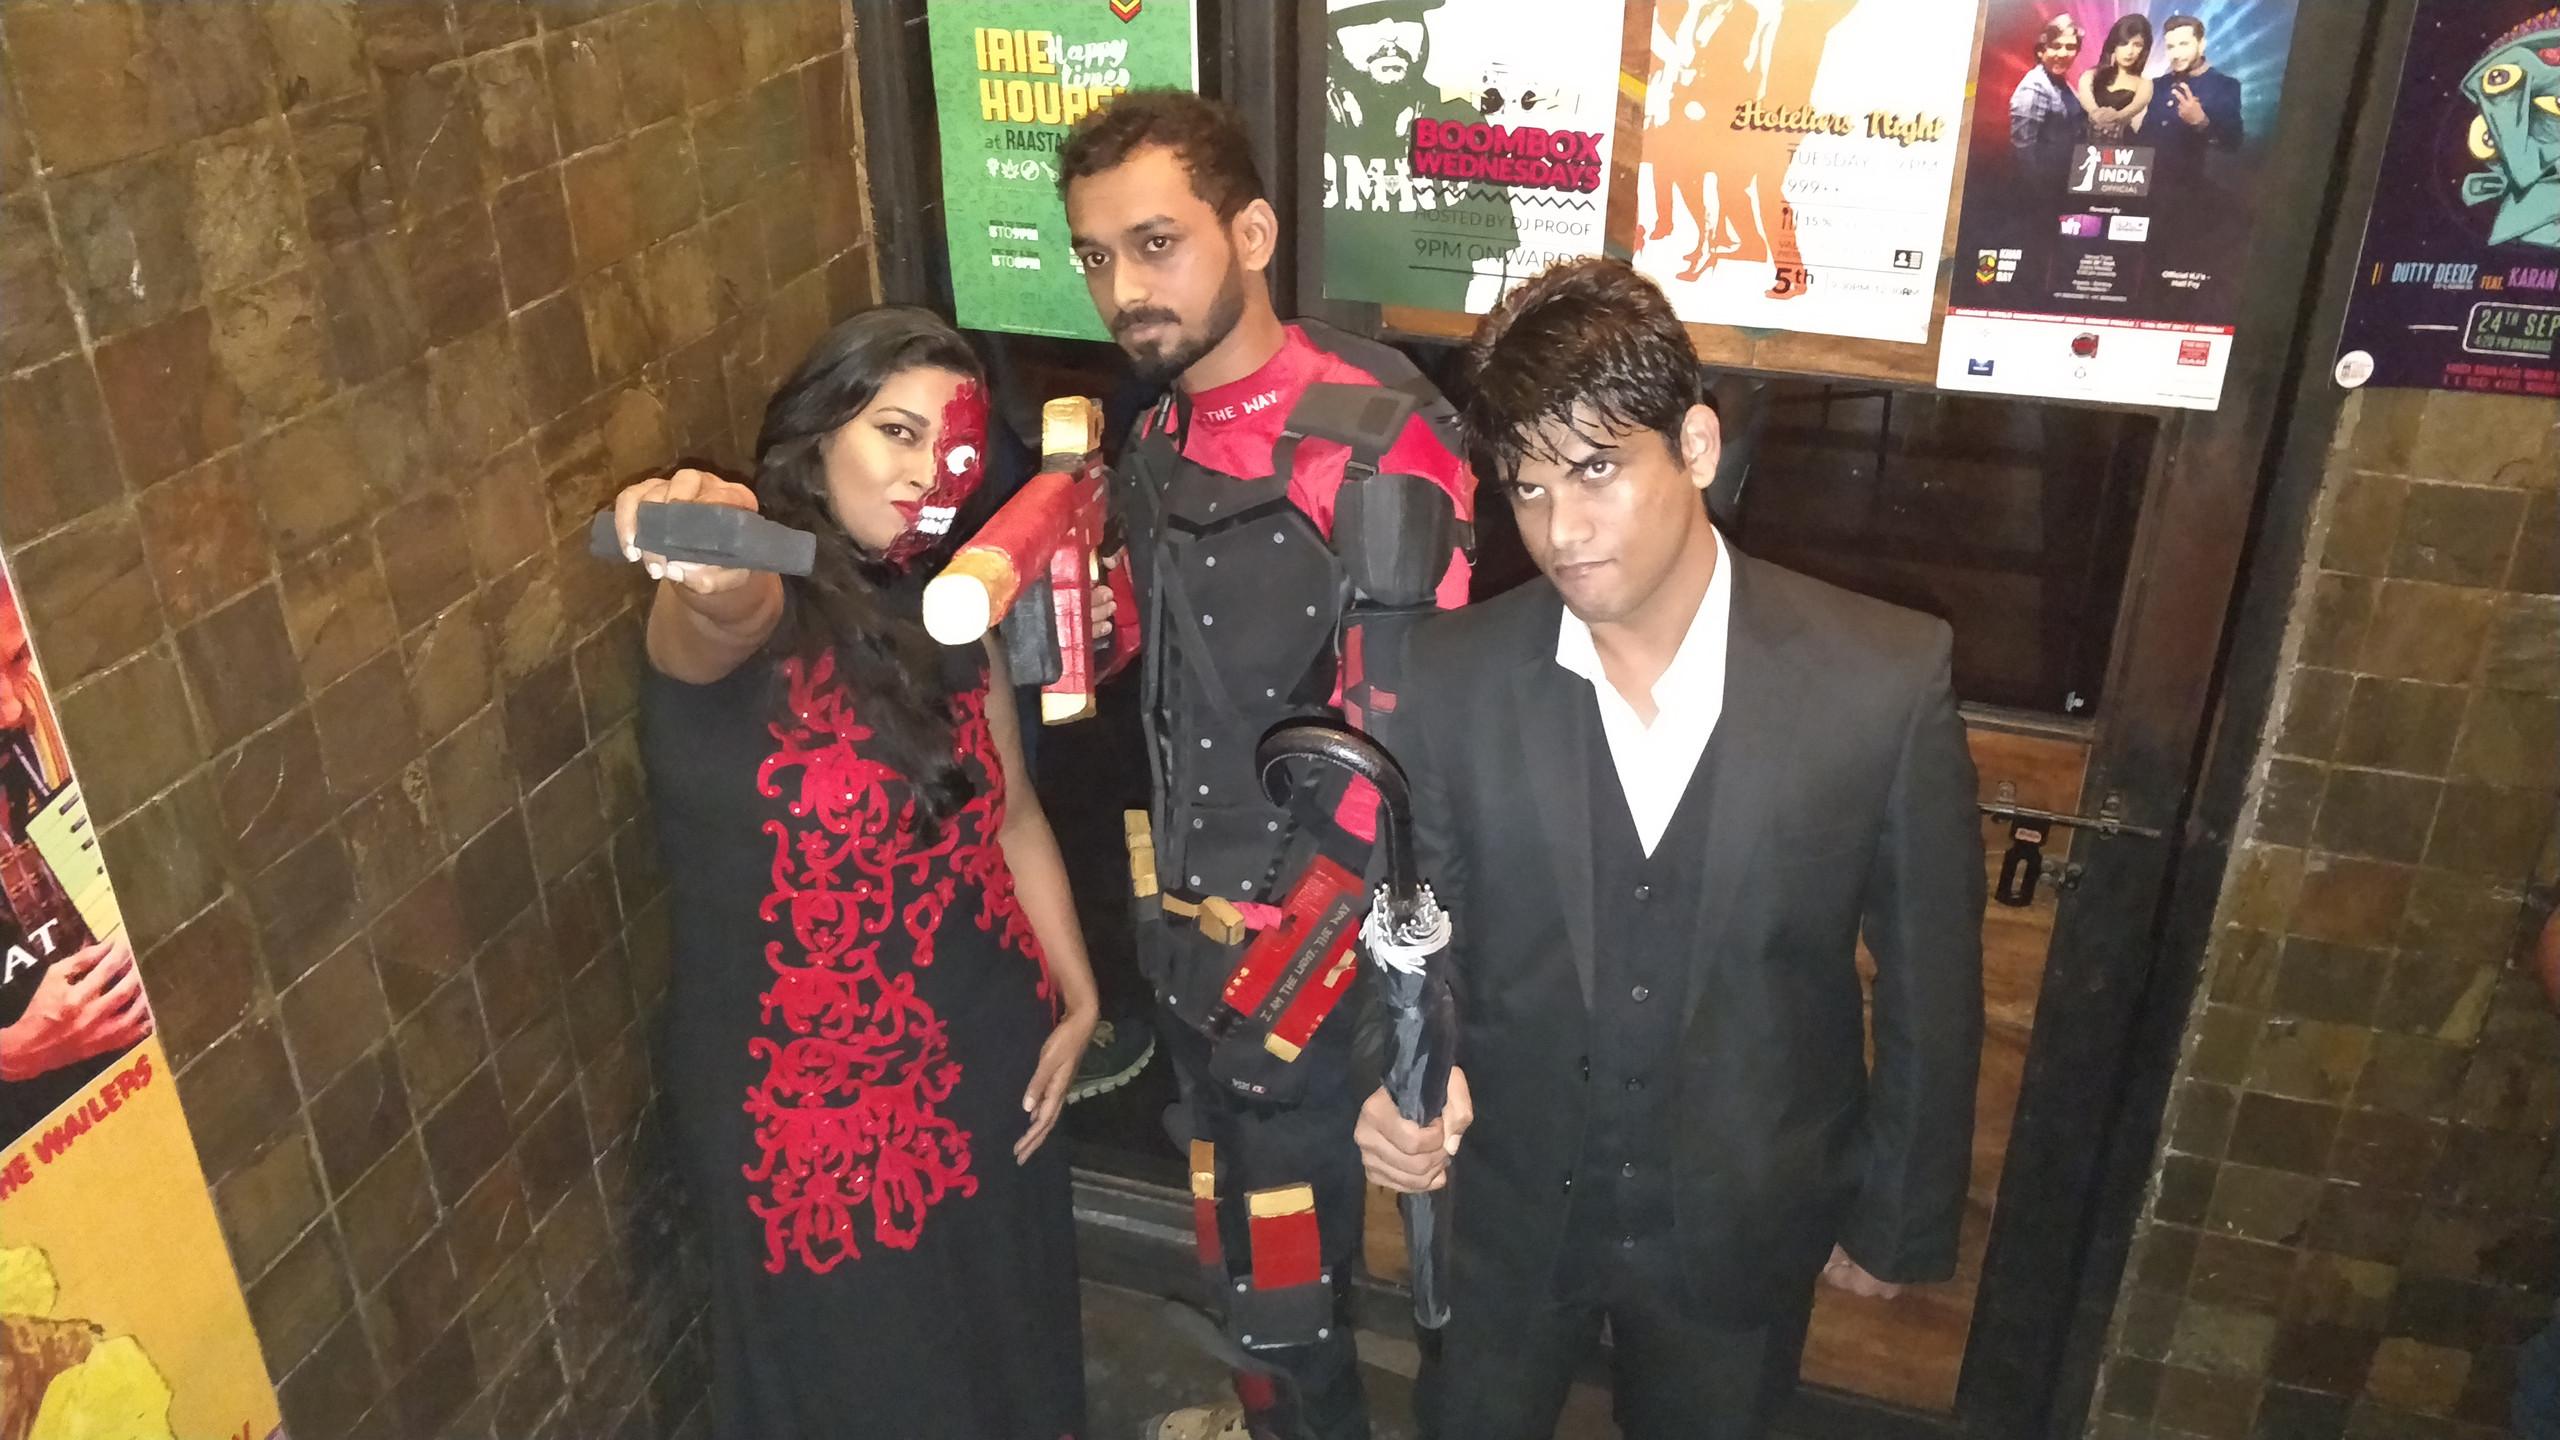 TJ, Nickk & Gaurav | Cosplayers